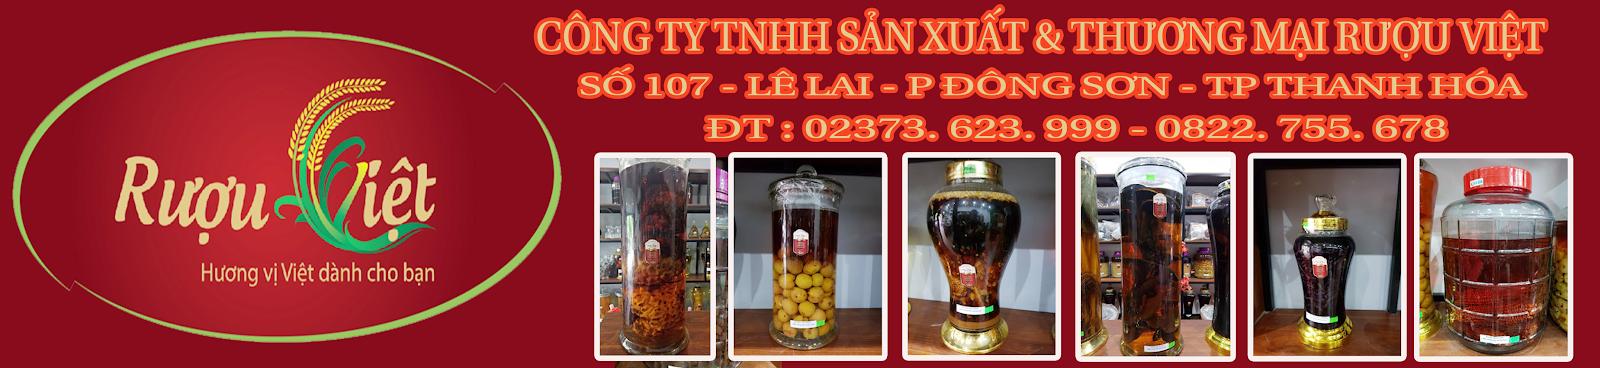 Rượu Việt